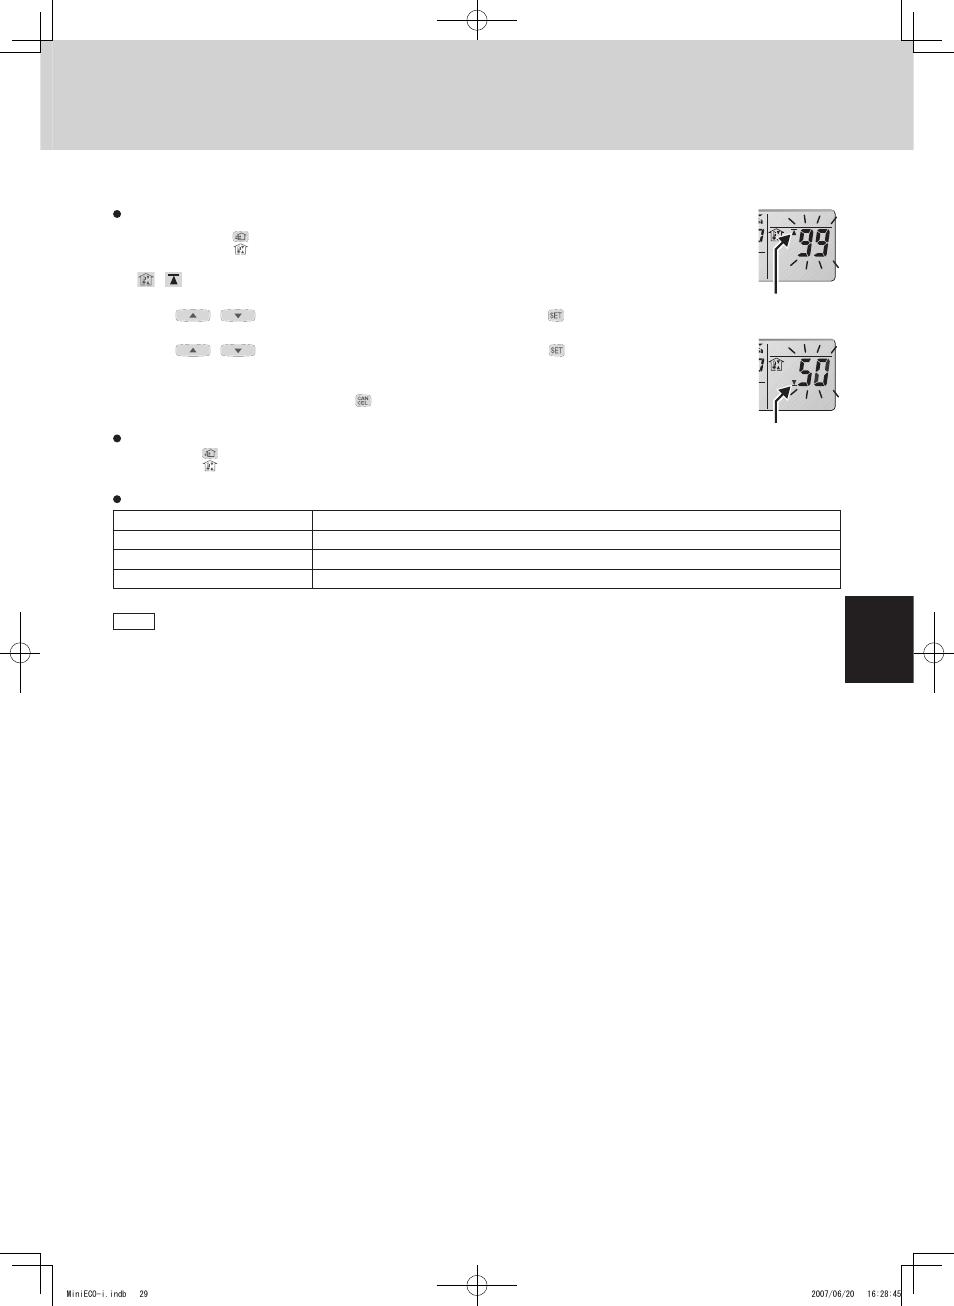 timer remote controller rcs tm80bg sanyo chx06052 user manual rh manualsdir com sanyo rcs-tm80bg user guide sanyo rcs-tm80bg owners manual